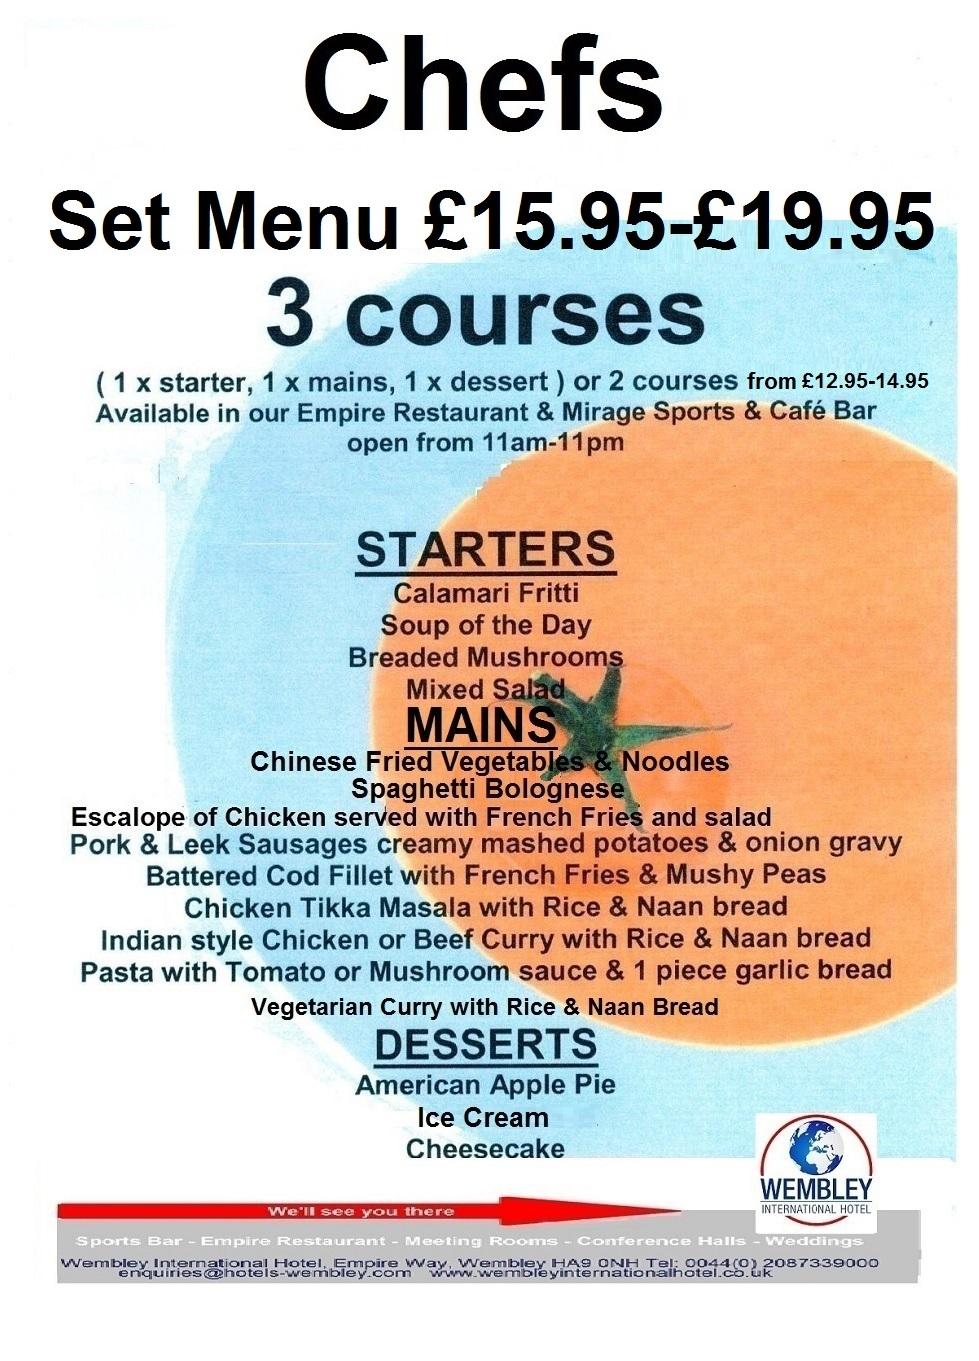 Wembley Empire Restaurant 3 course set menu